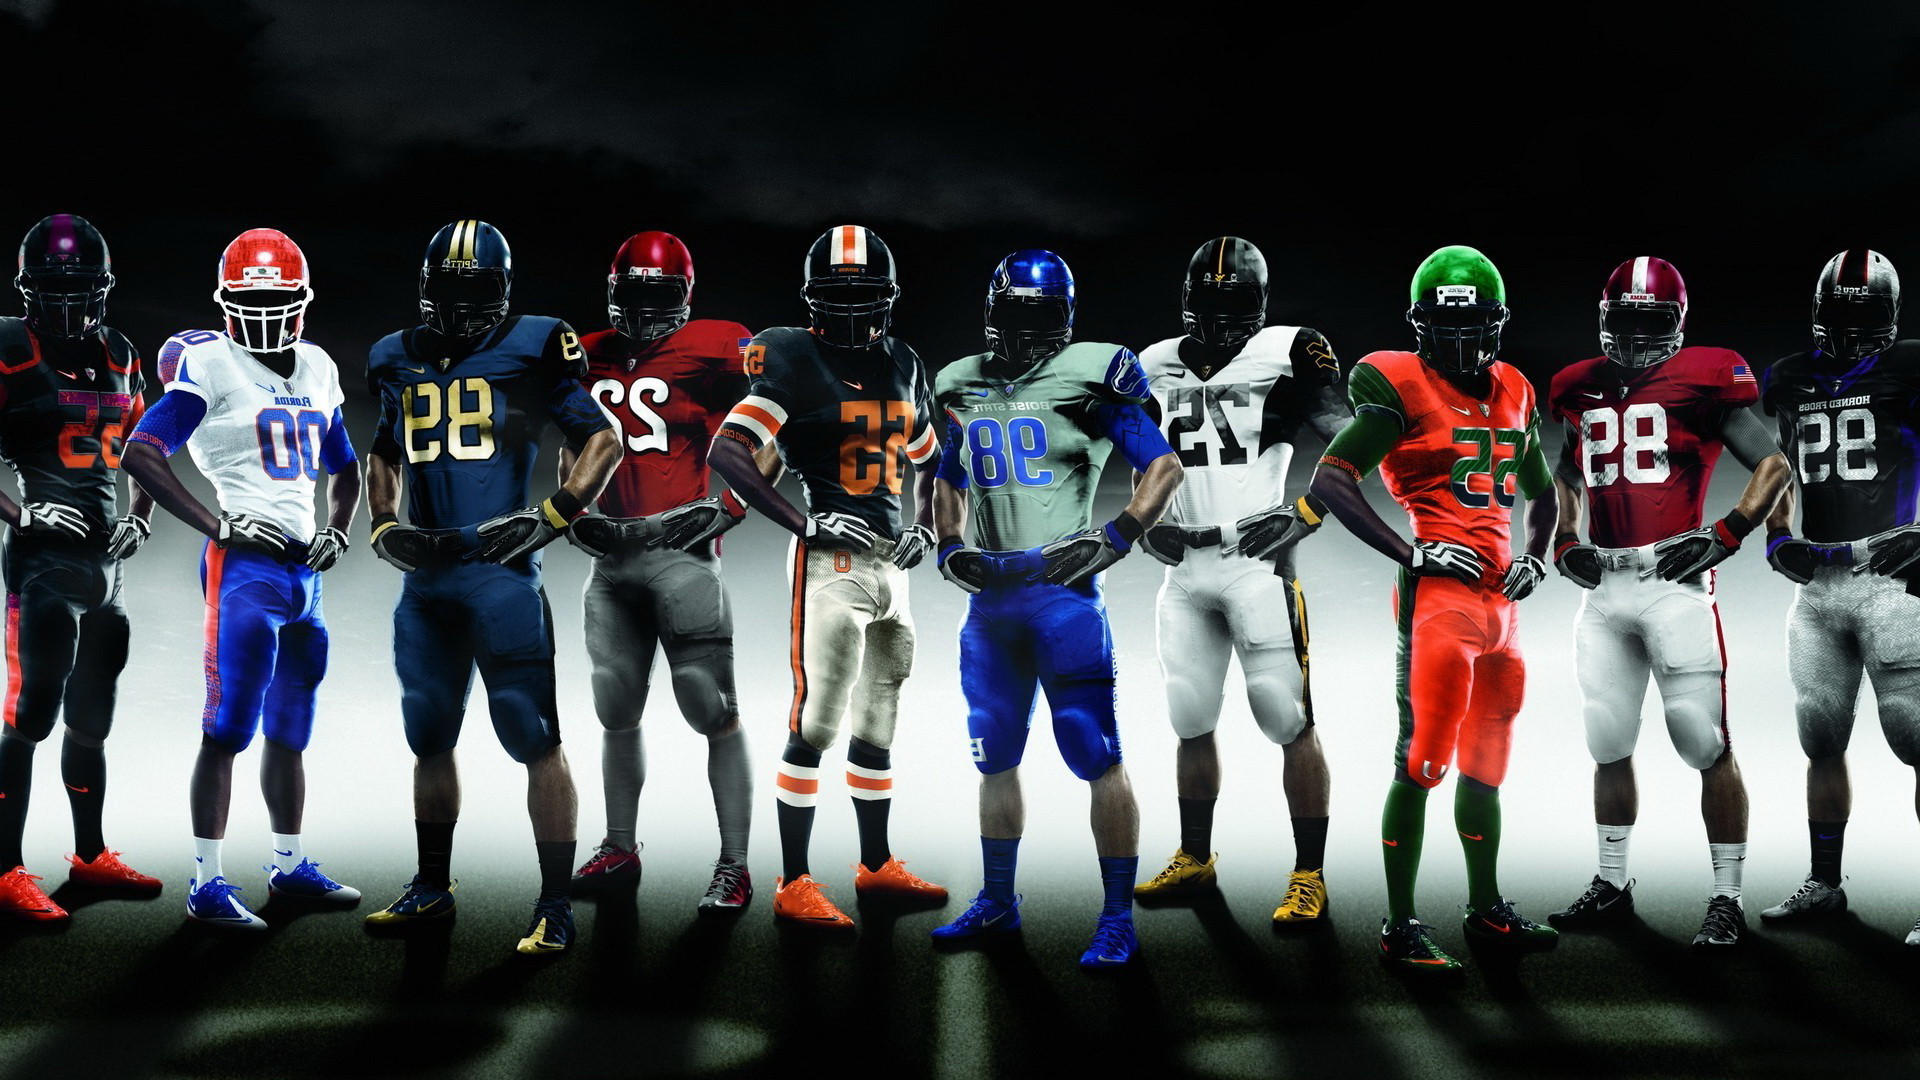 College Football Team Wallpapers Tags: college football teams